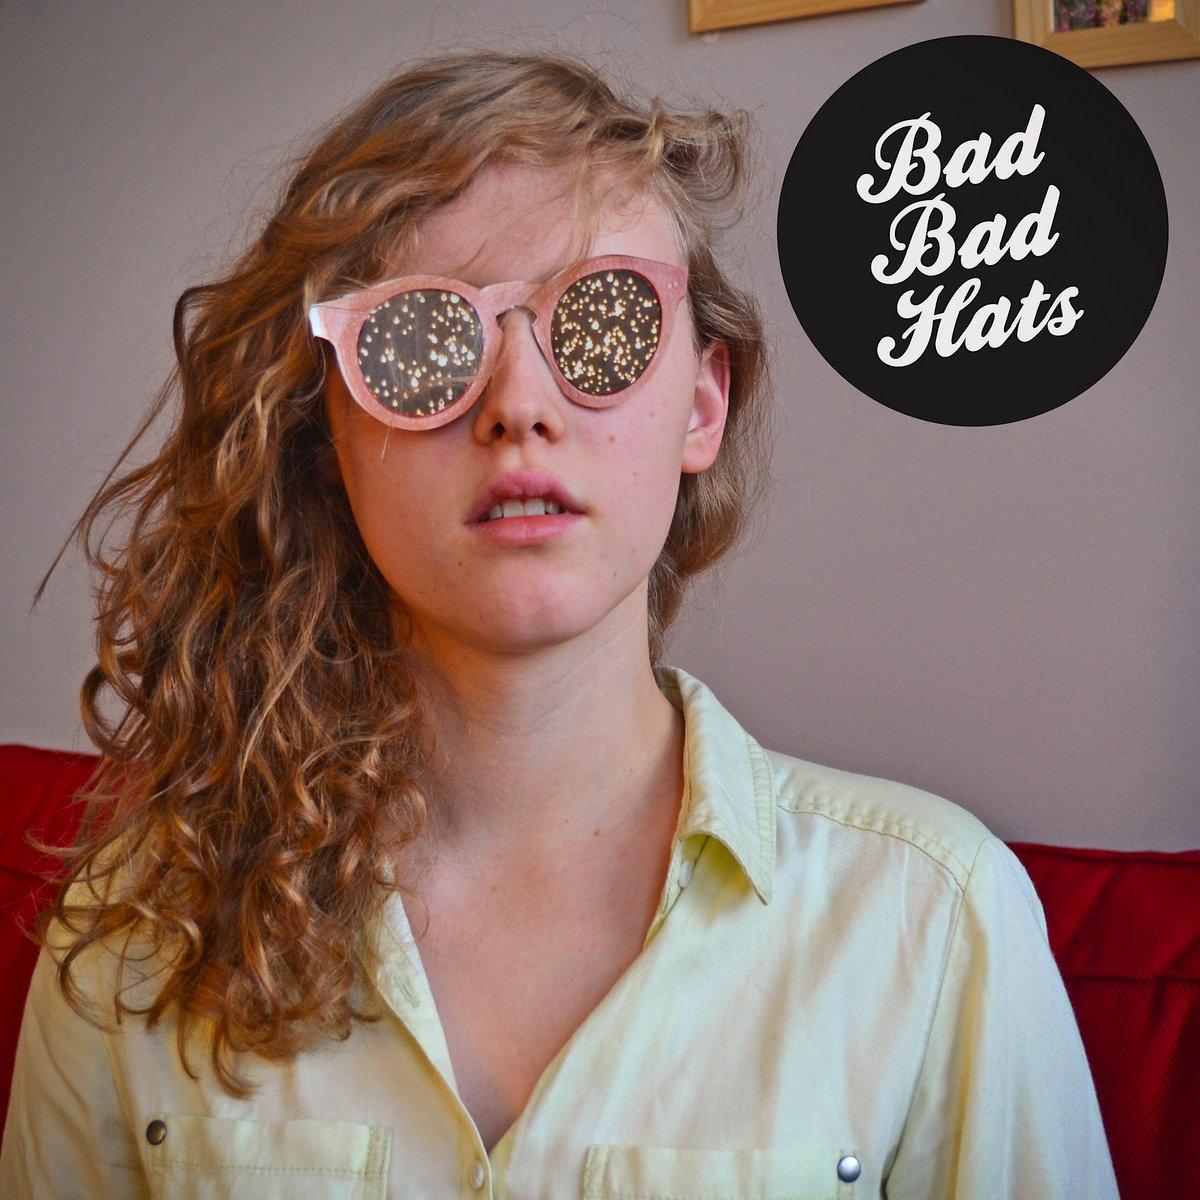 A Bout Bad Bad Hats